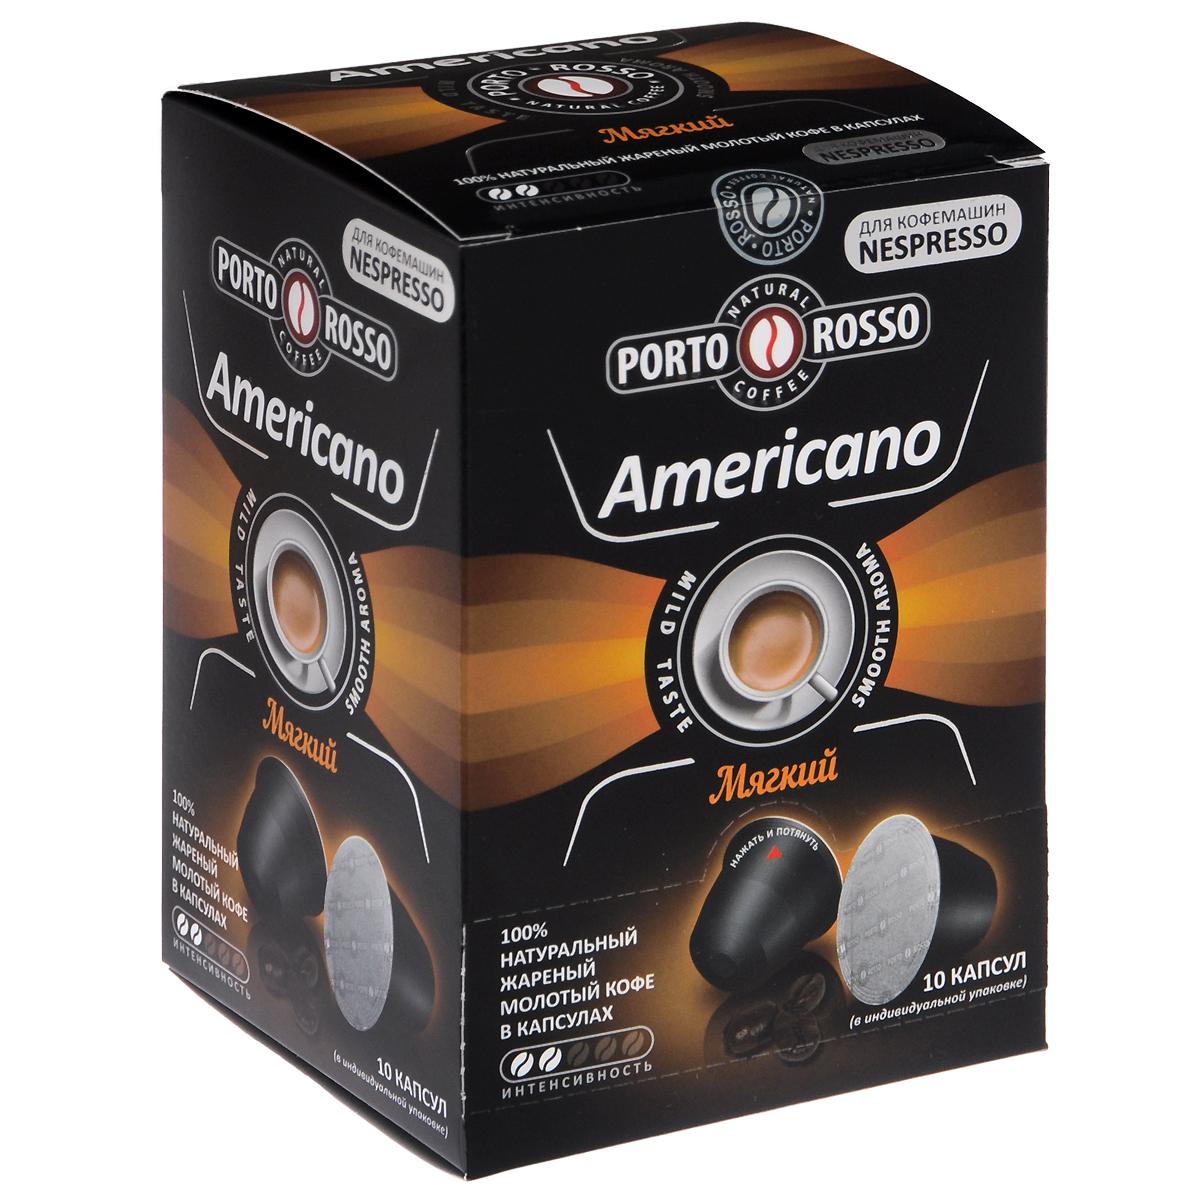 Porto Rosso Americano кофейные капсулы